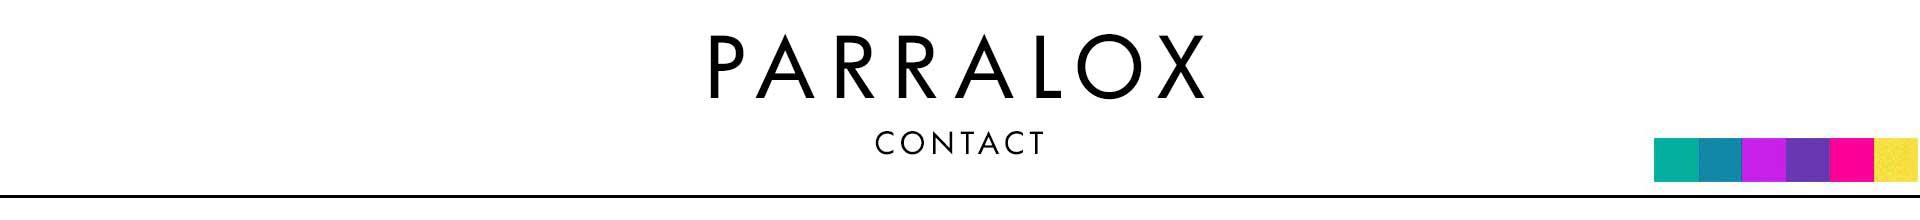 Parralox - Contact